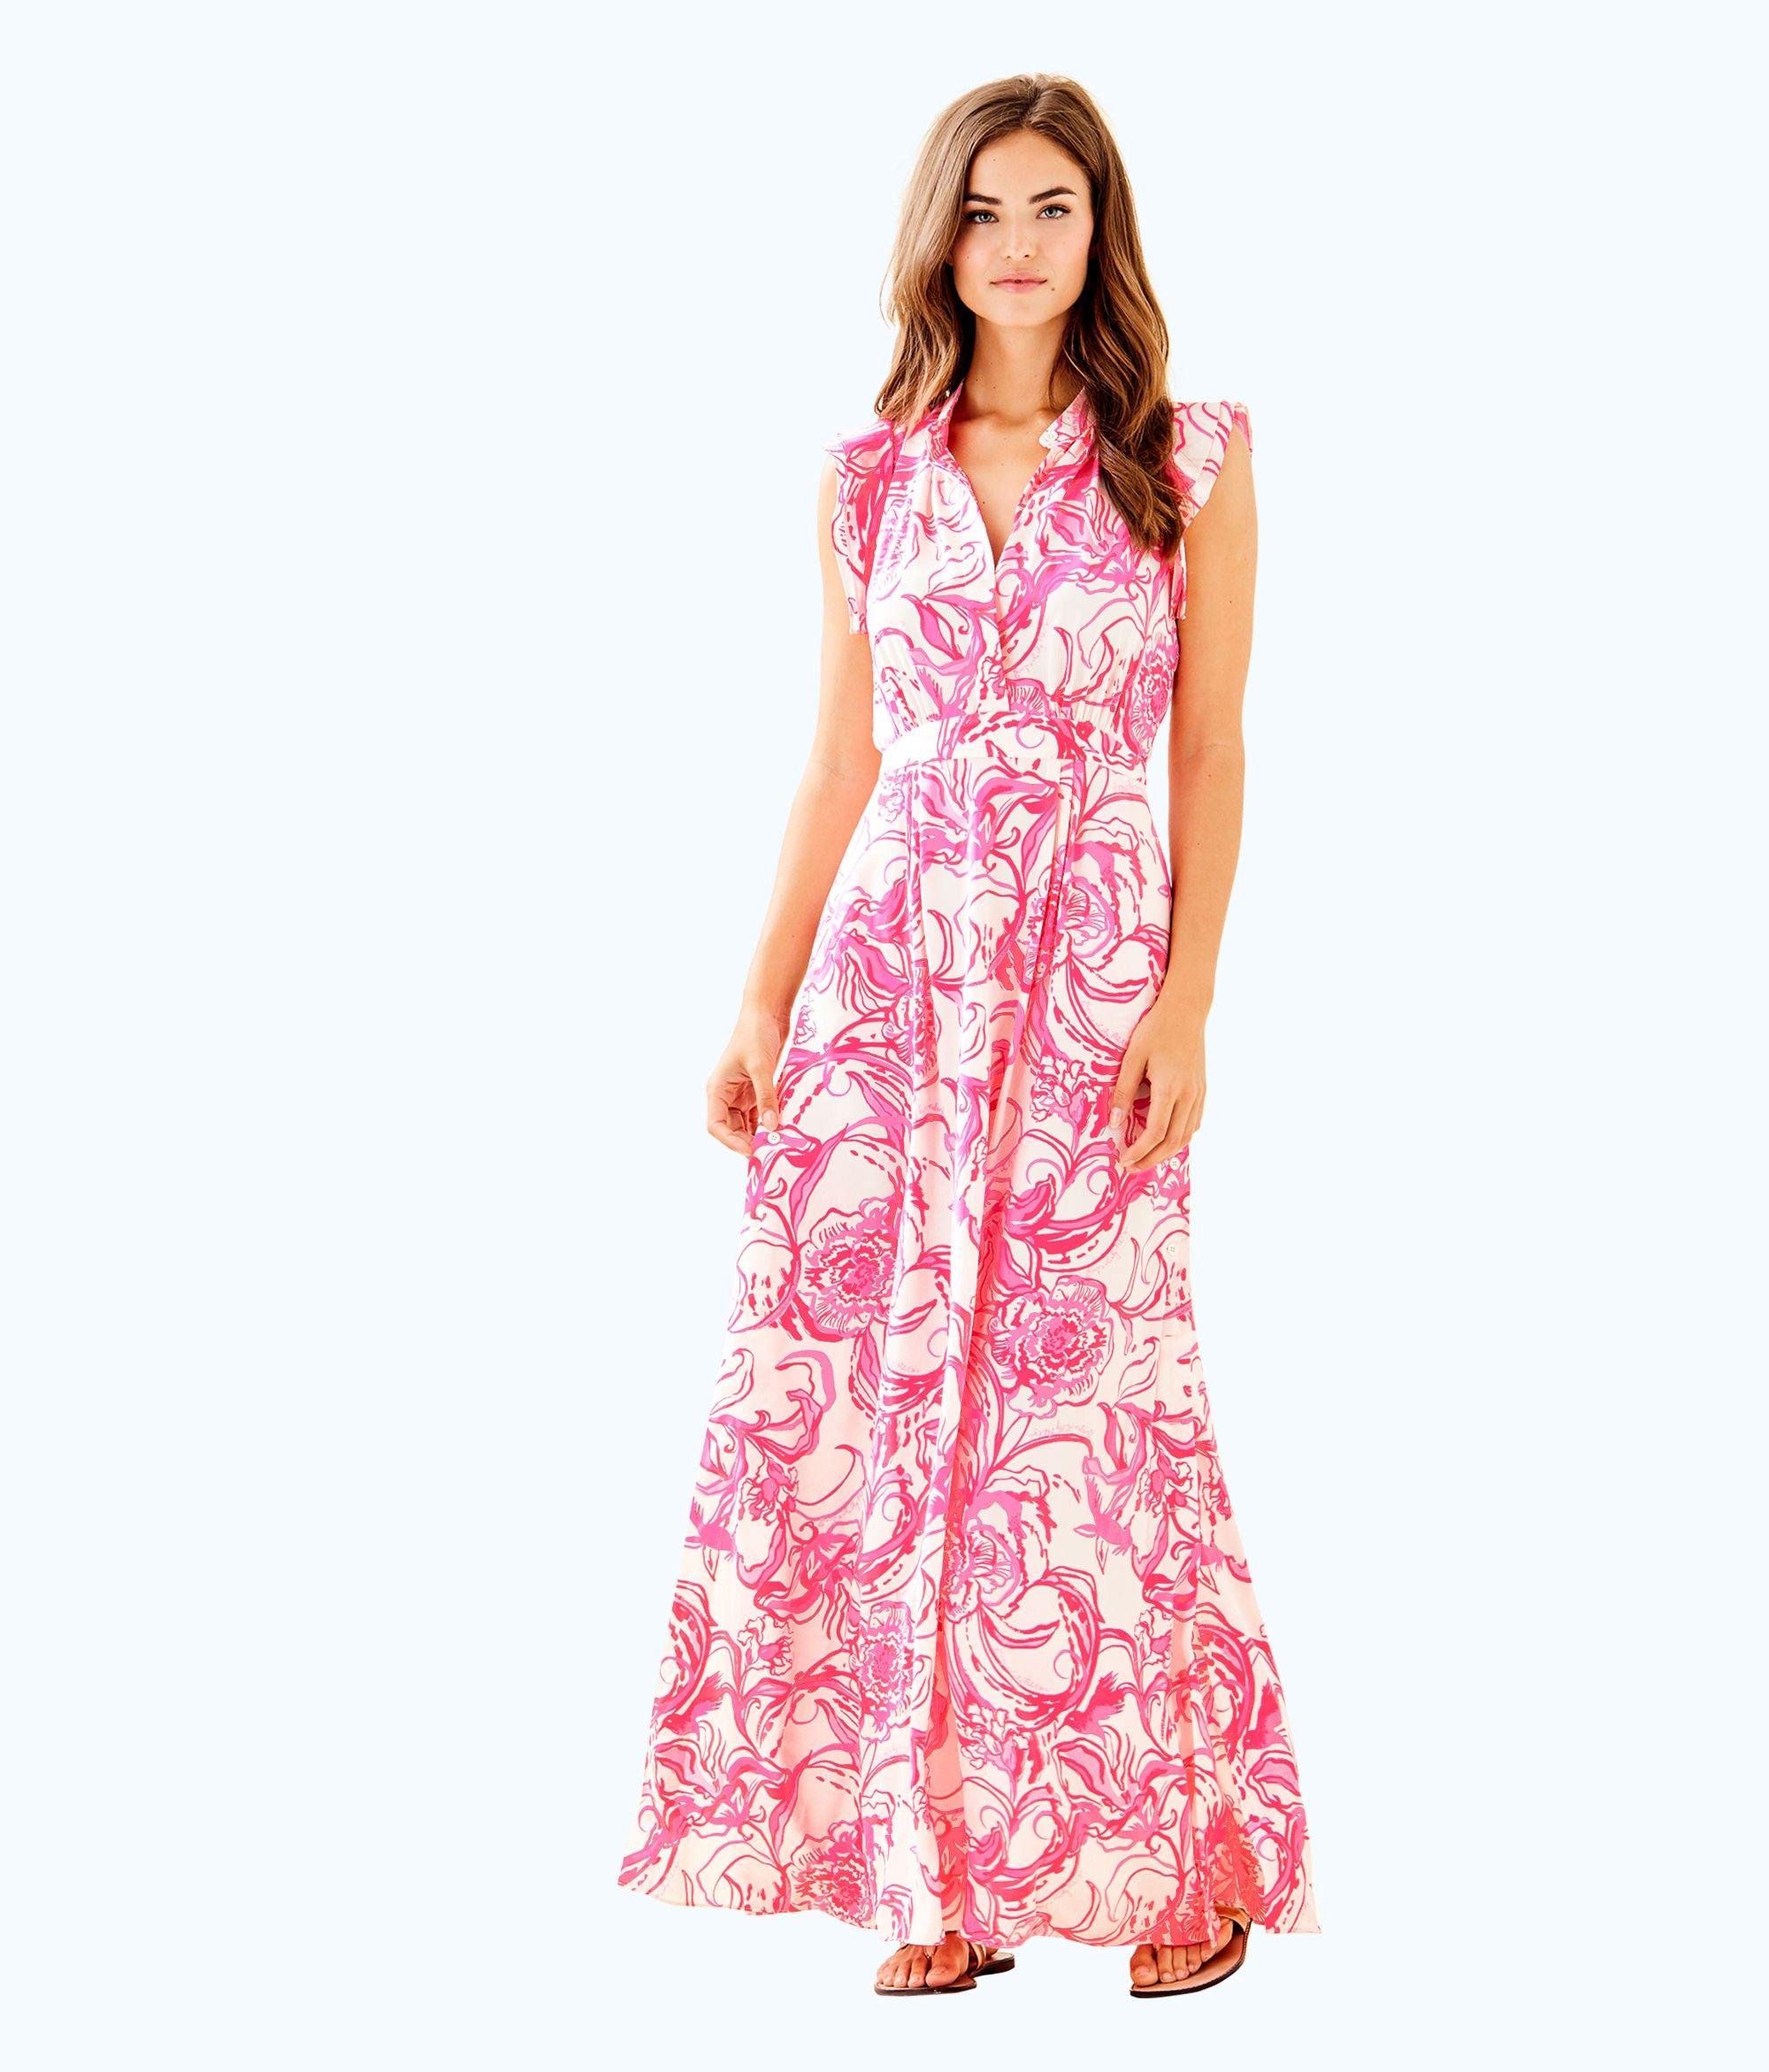 05e8ebbfb51 Lilly Pulitzer Goop X Palm Beach Silk Maxi Dress - 14